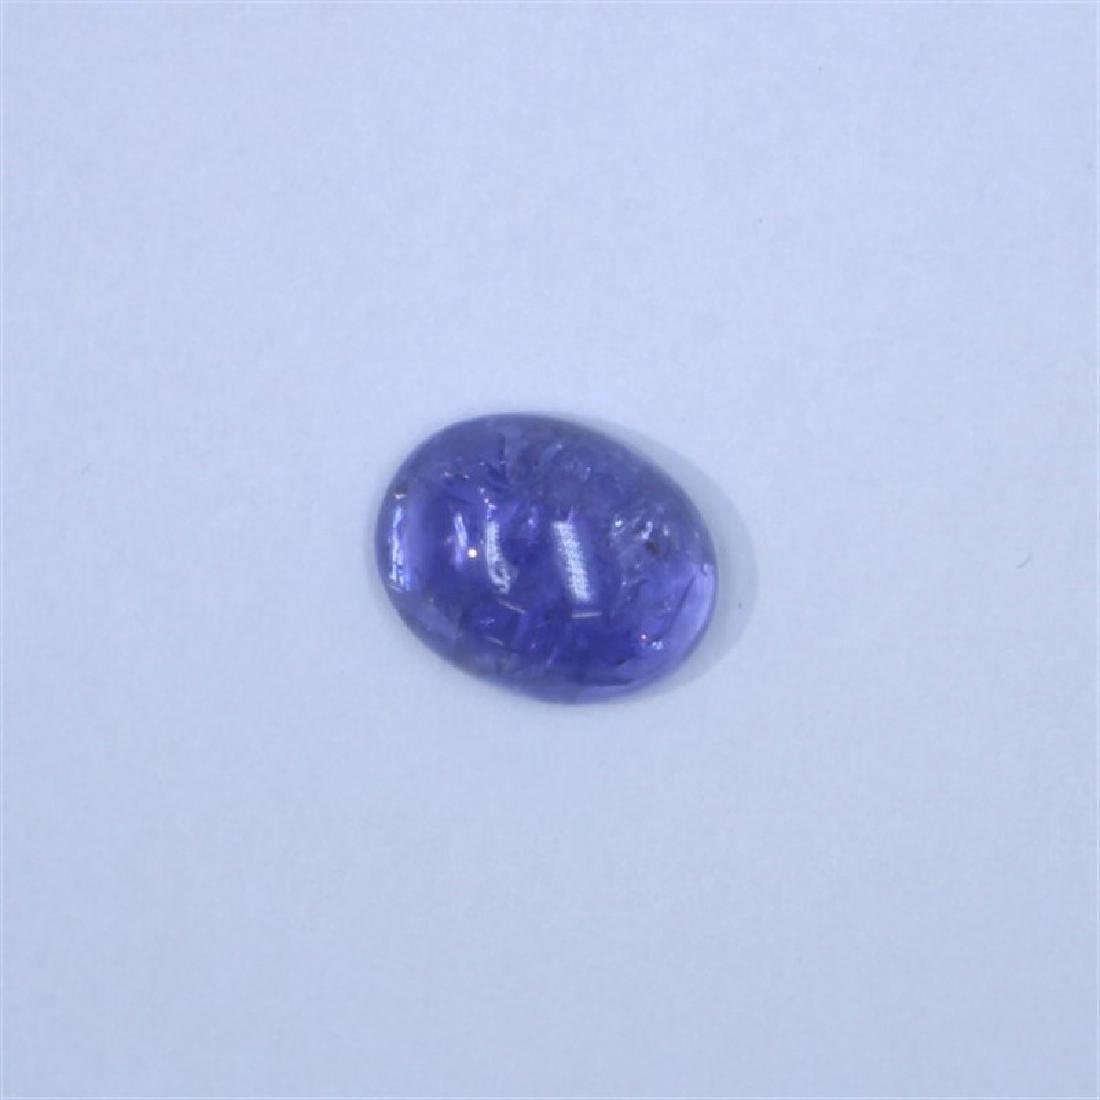 5.43ct Tanzanite cab oval cut